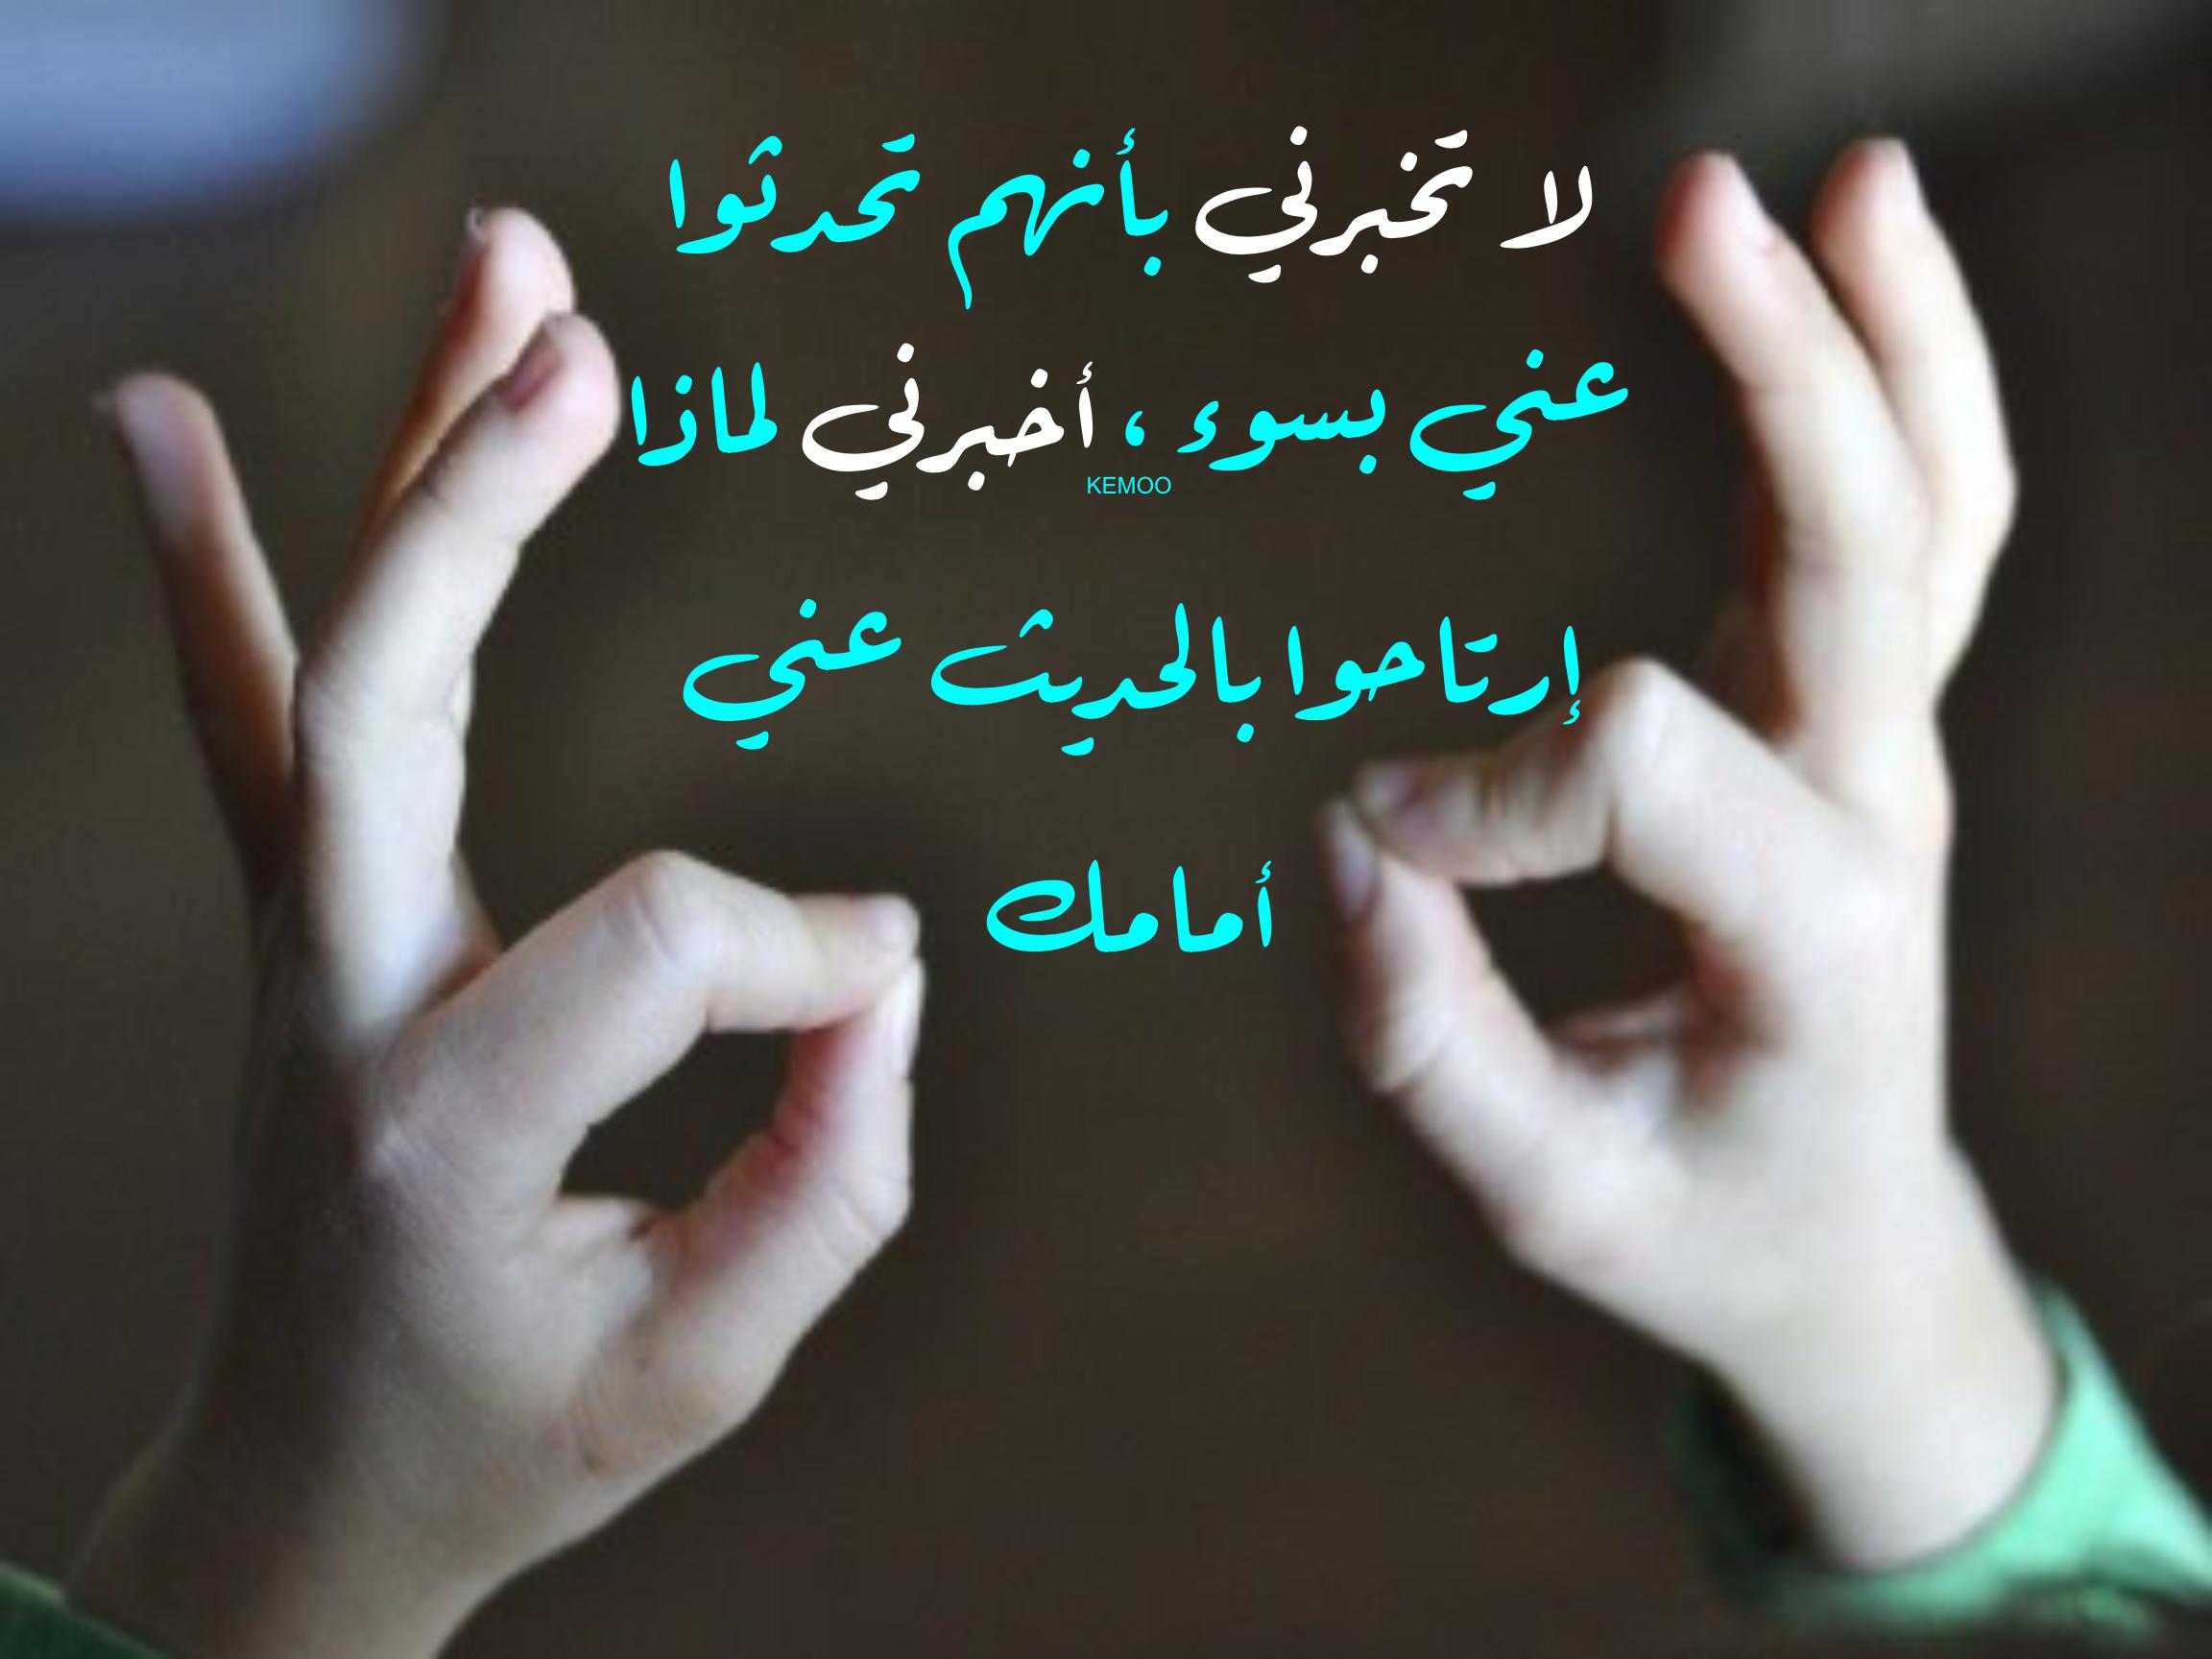 الصداقة Lovely Quote Words Quotes